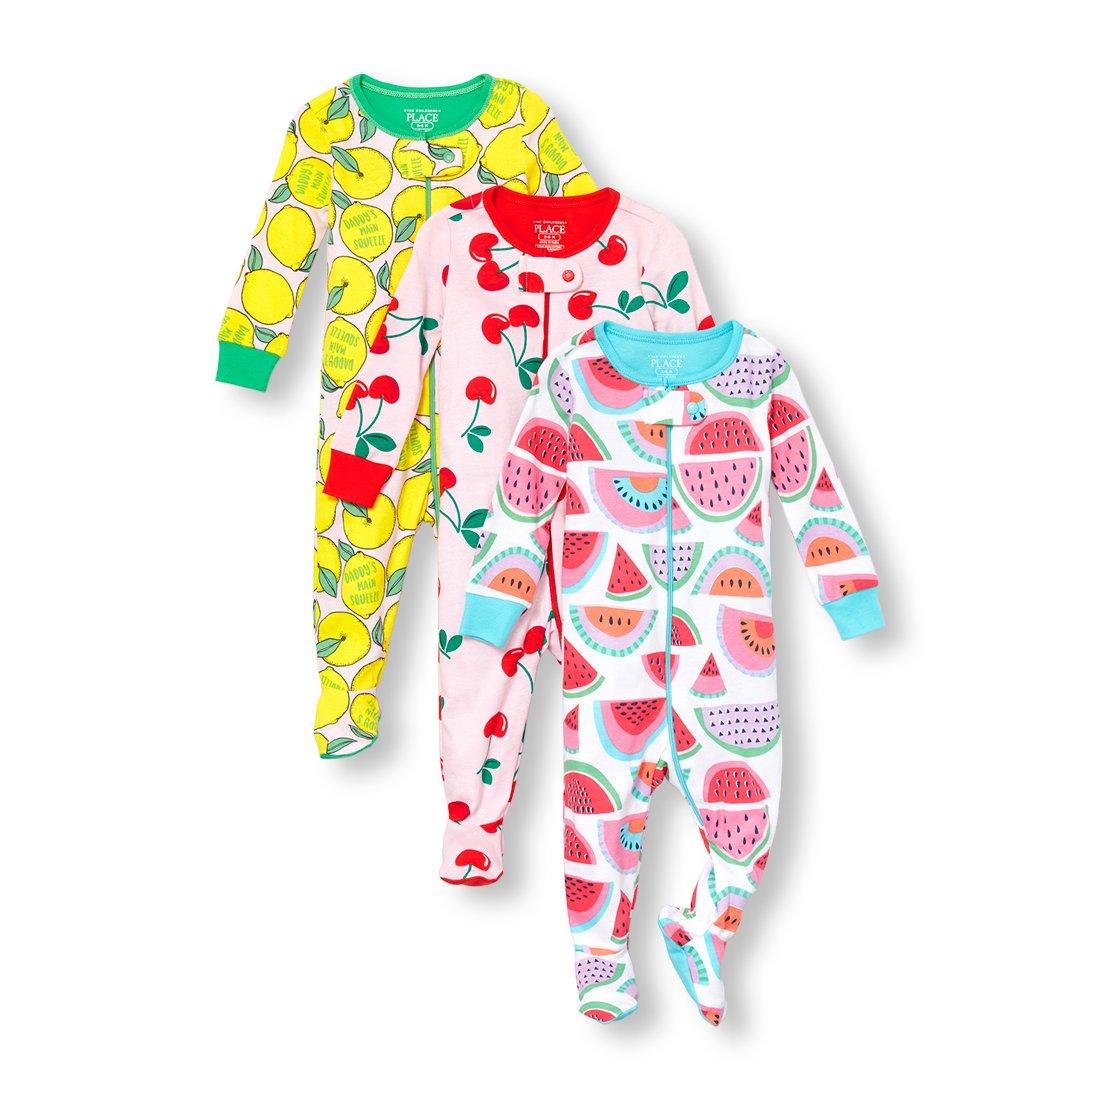 The Children's Place Baby Girls 3 Piece Stretchie Bundle, Multi Clr, 18-24MONTH